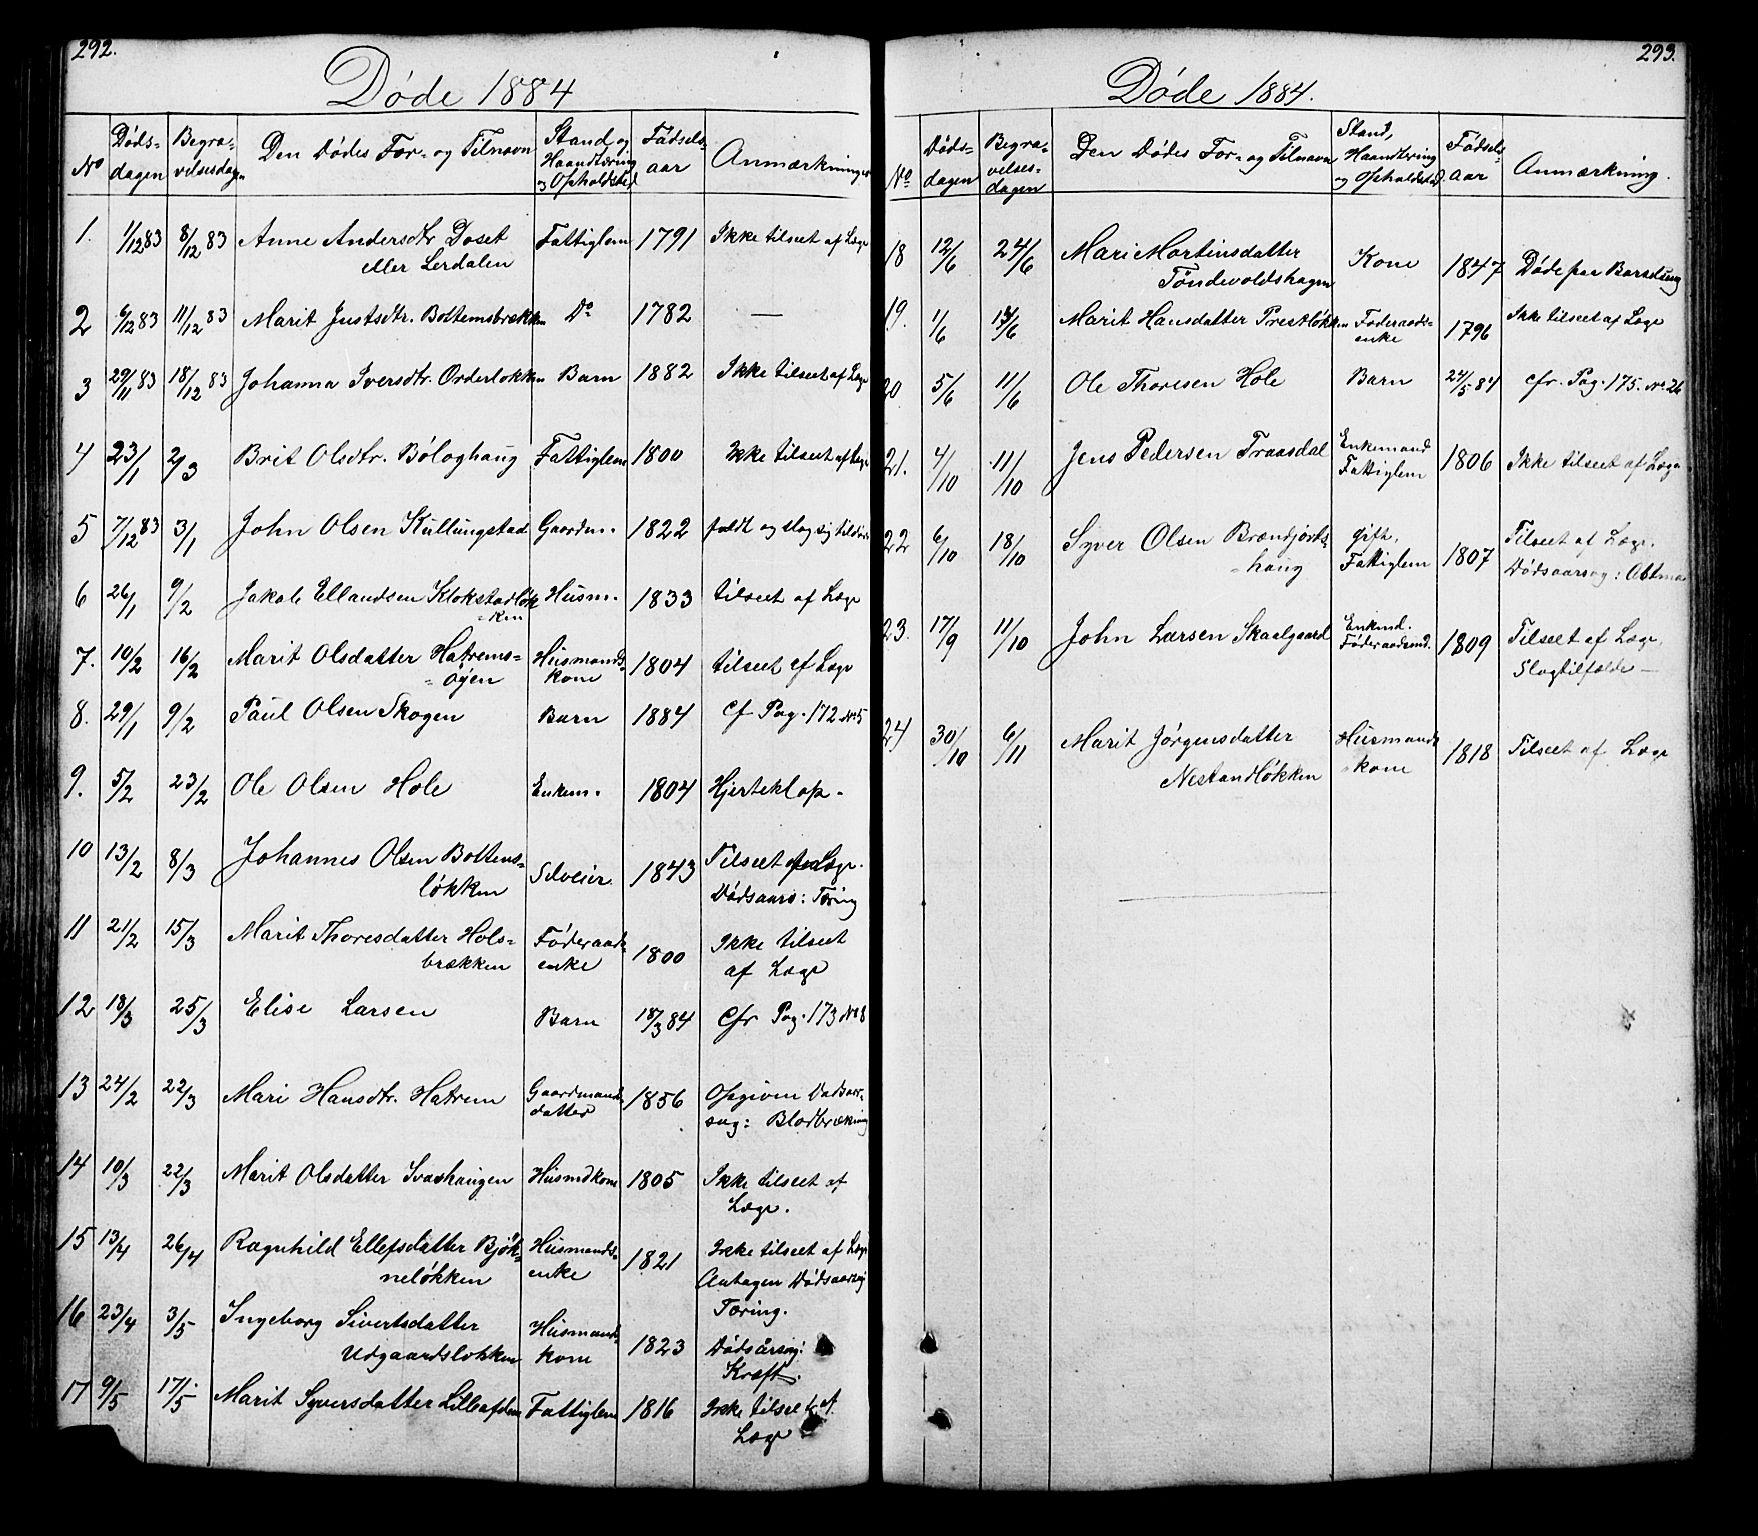 SAH, Lesja prestekontor, Klokkerbok nr. 5, 1850-1894, s. 292-293